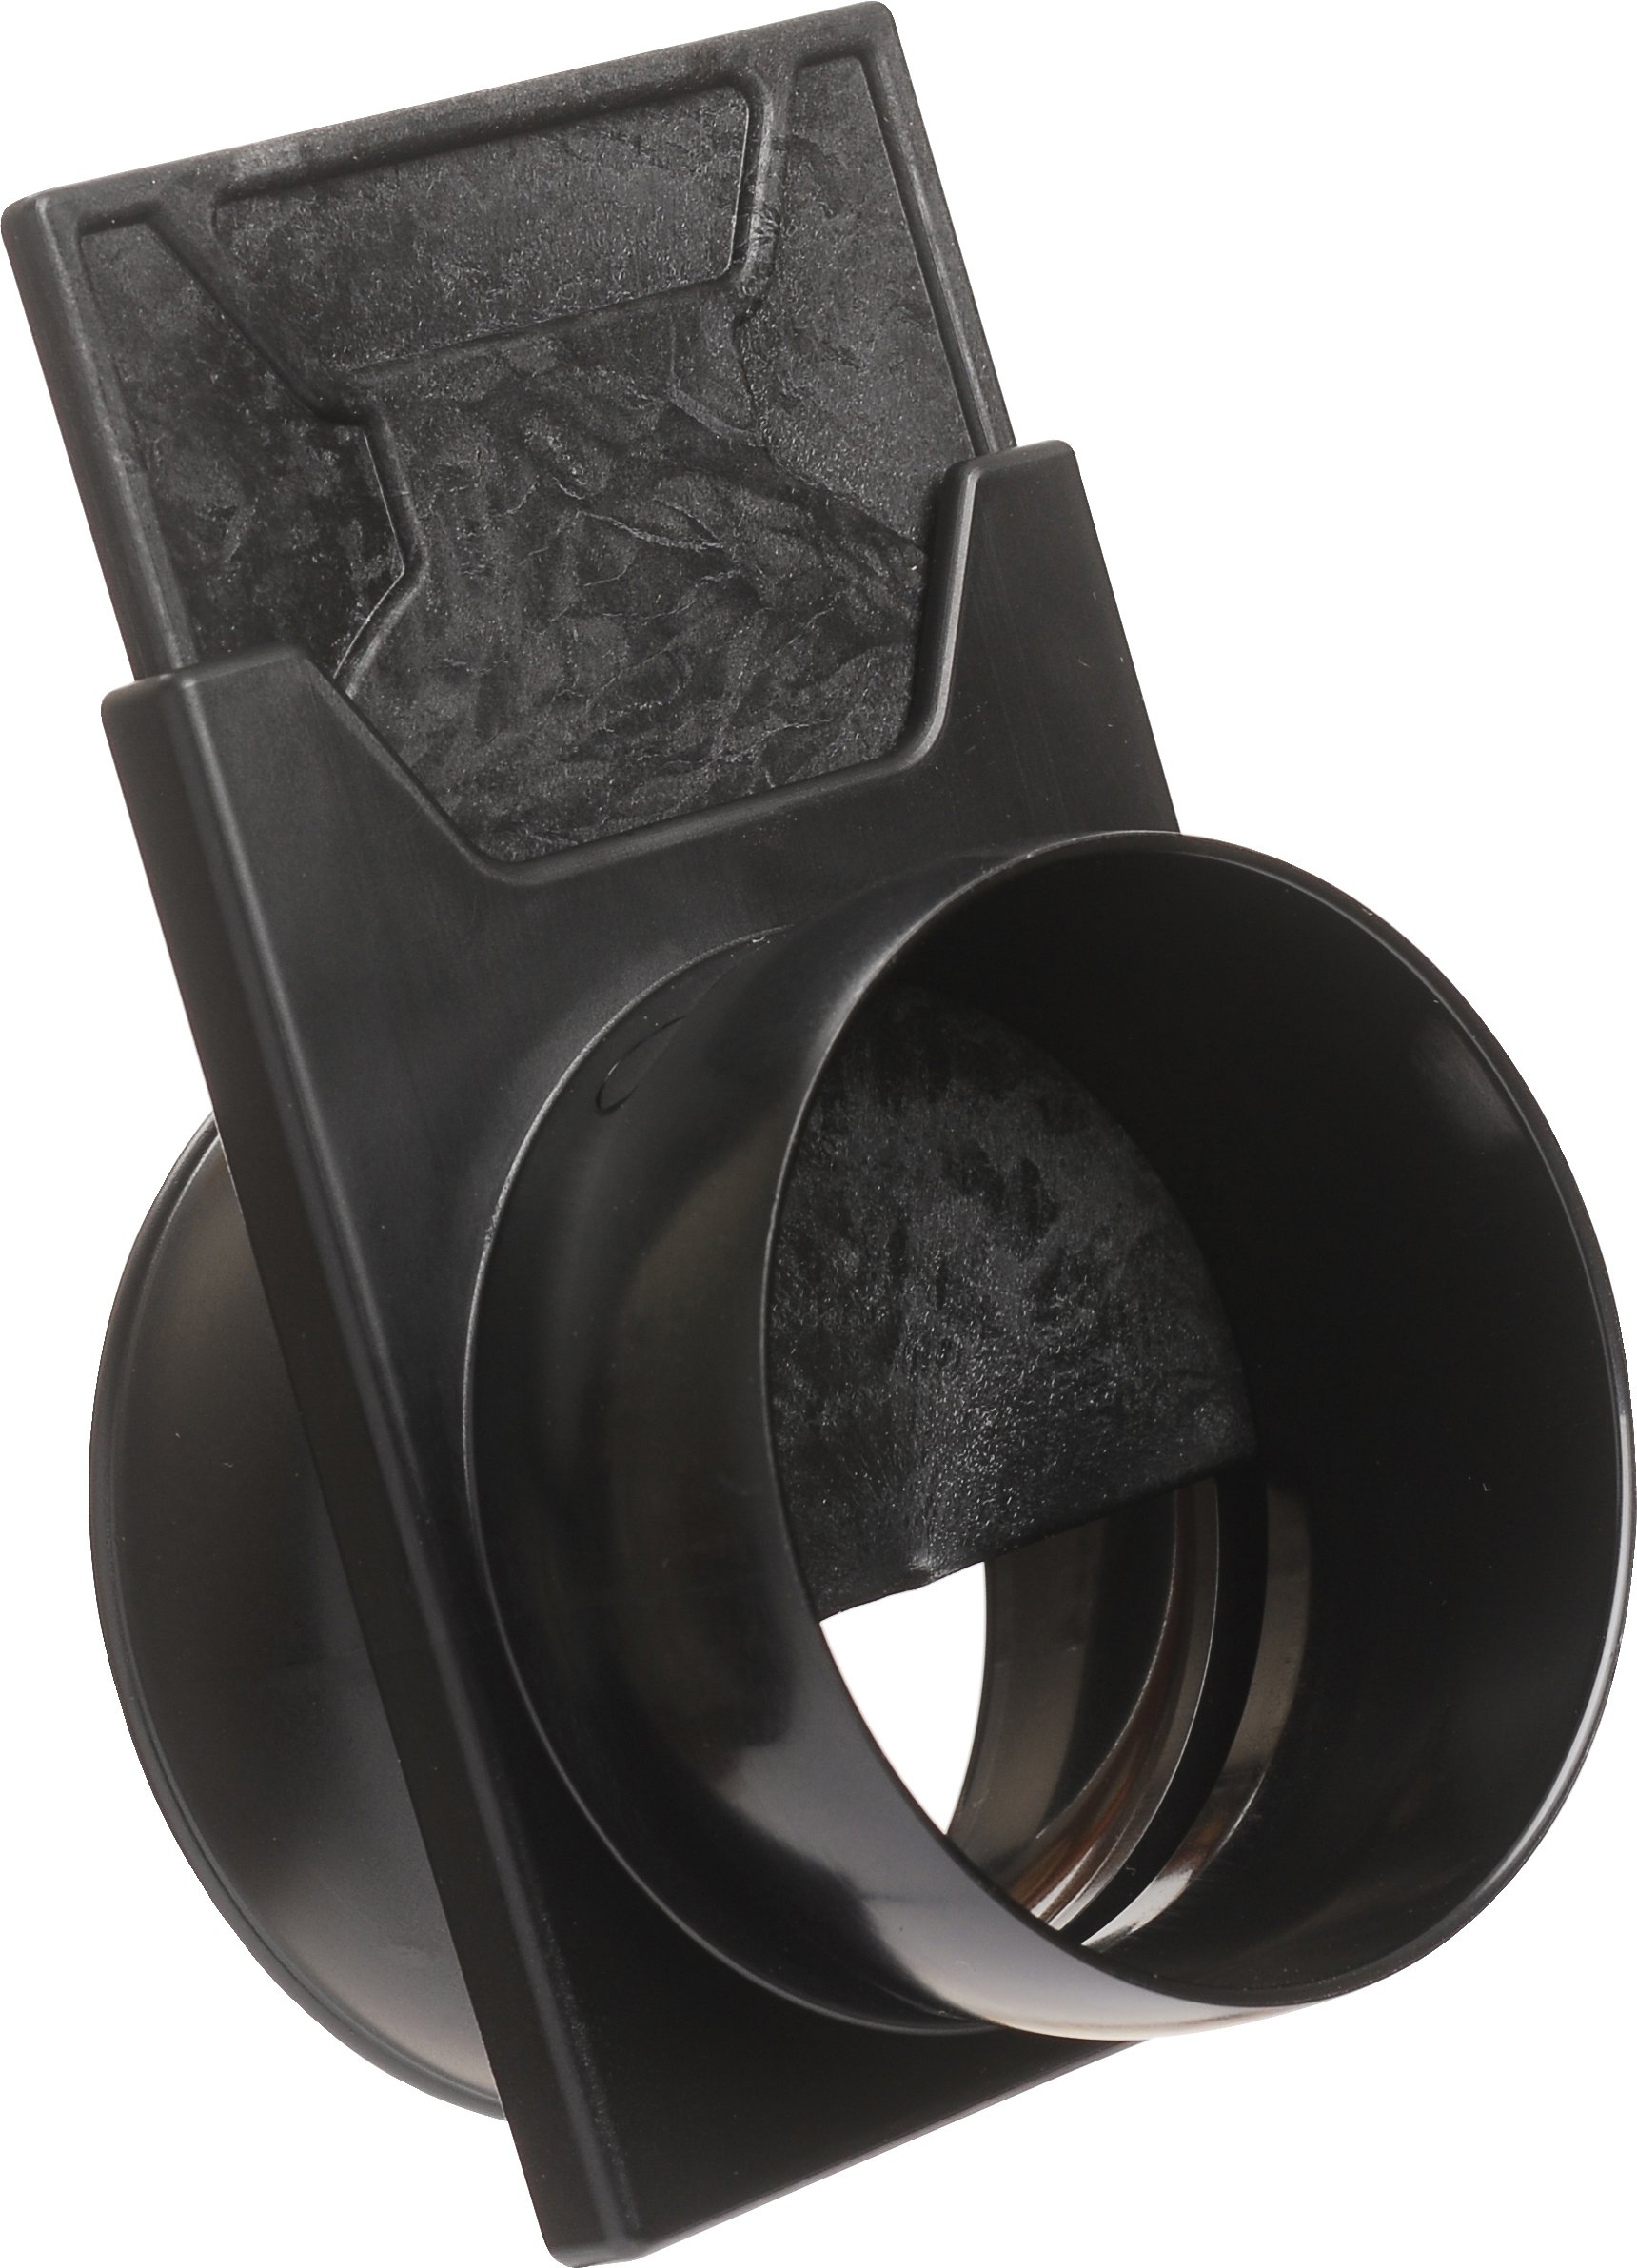 Loc-Line Anti-Static Vacuum Hose Component, Black Acetal Copolymer, Slide Valve, 2-1/2'' Hose ID